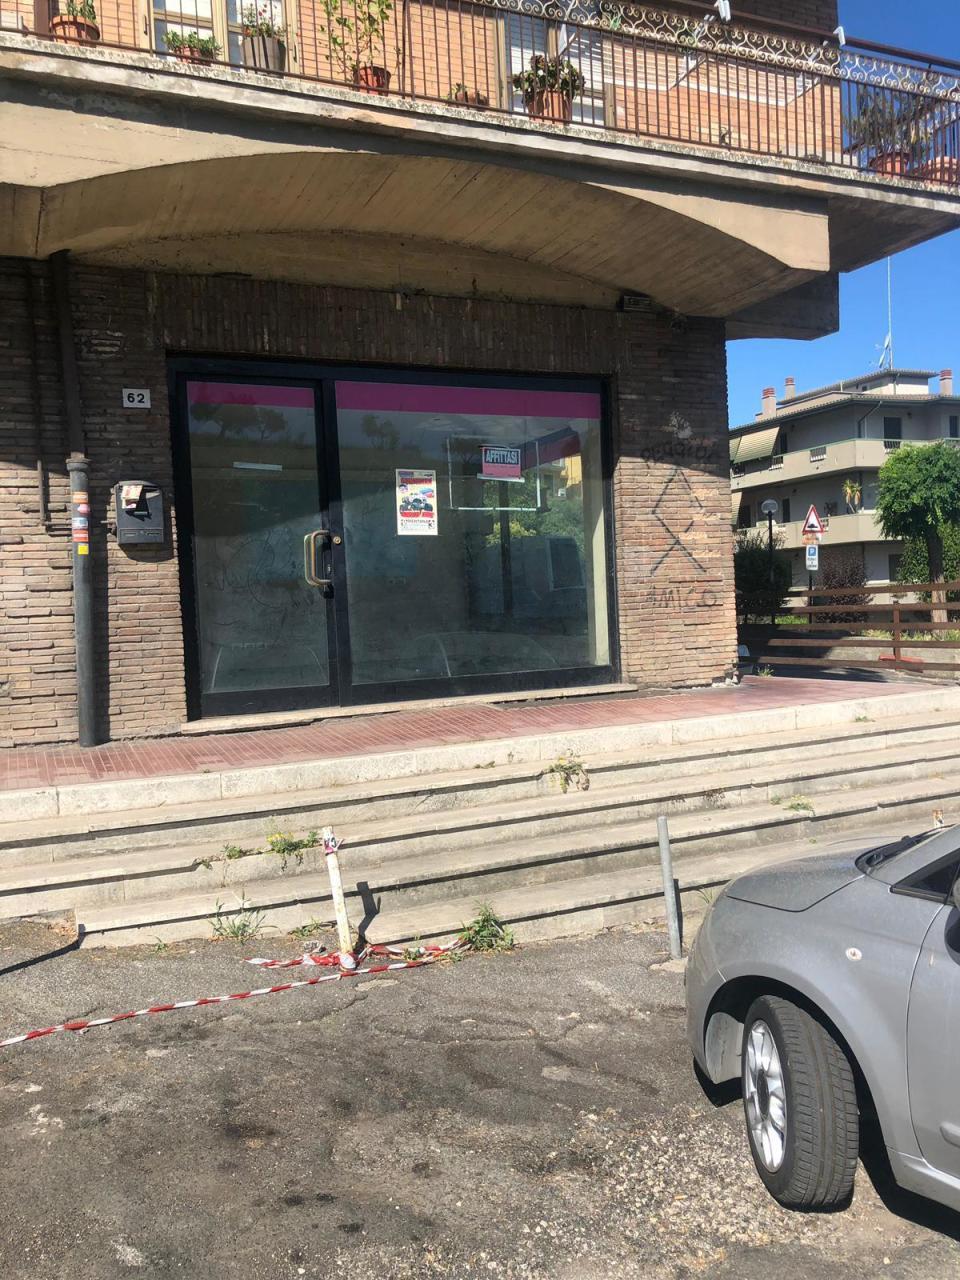 Locale commerciale - 2 Vetrine a Mentana Rif. 10525485